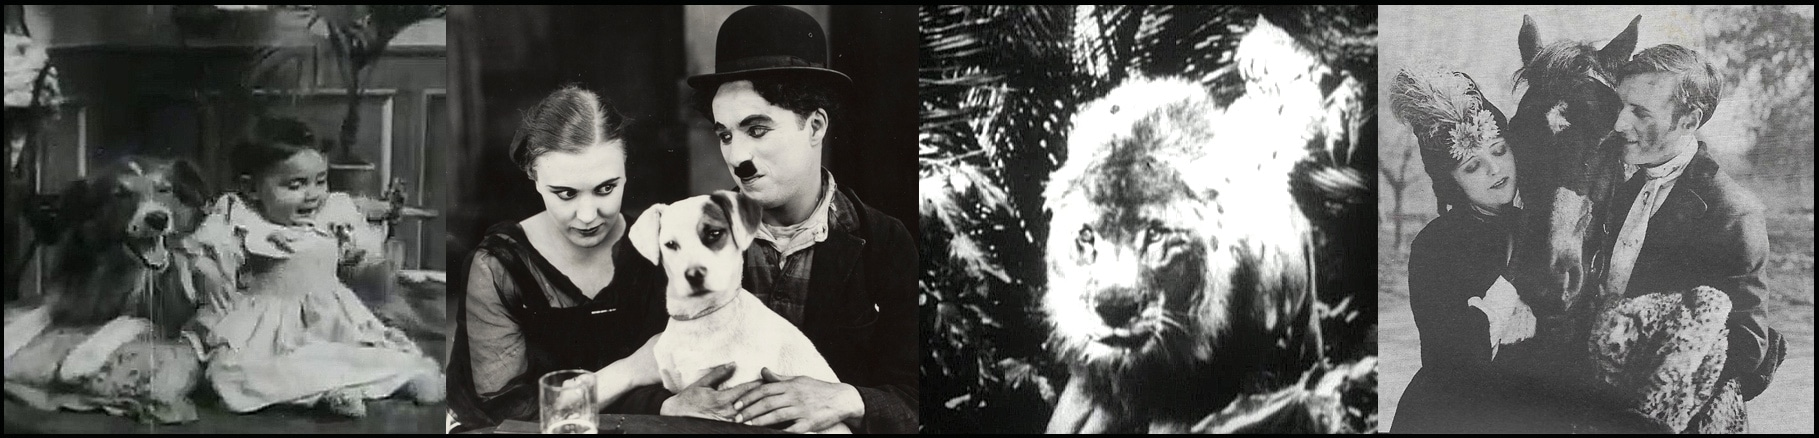 Tierspielfilm History